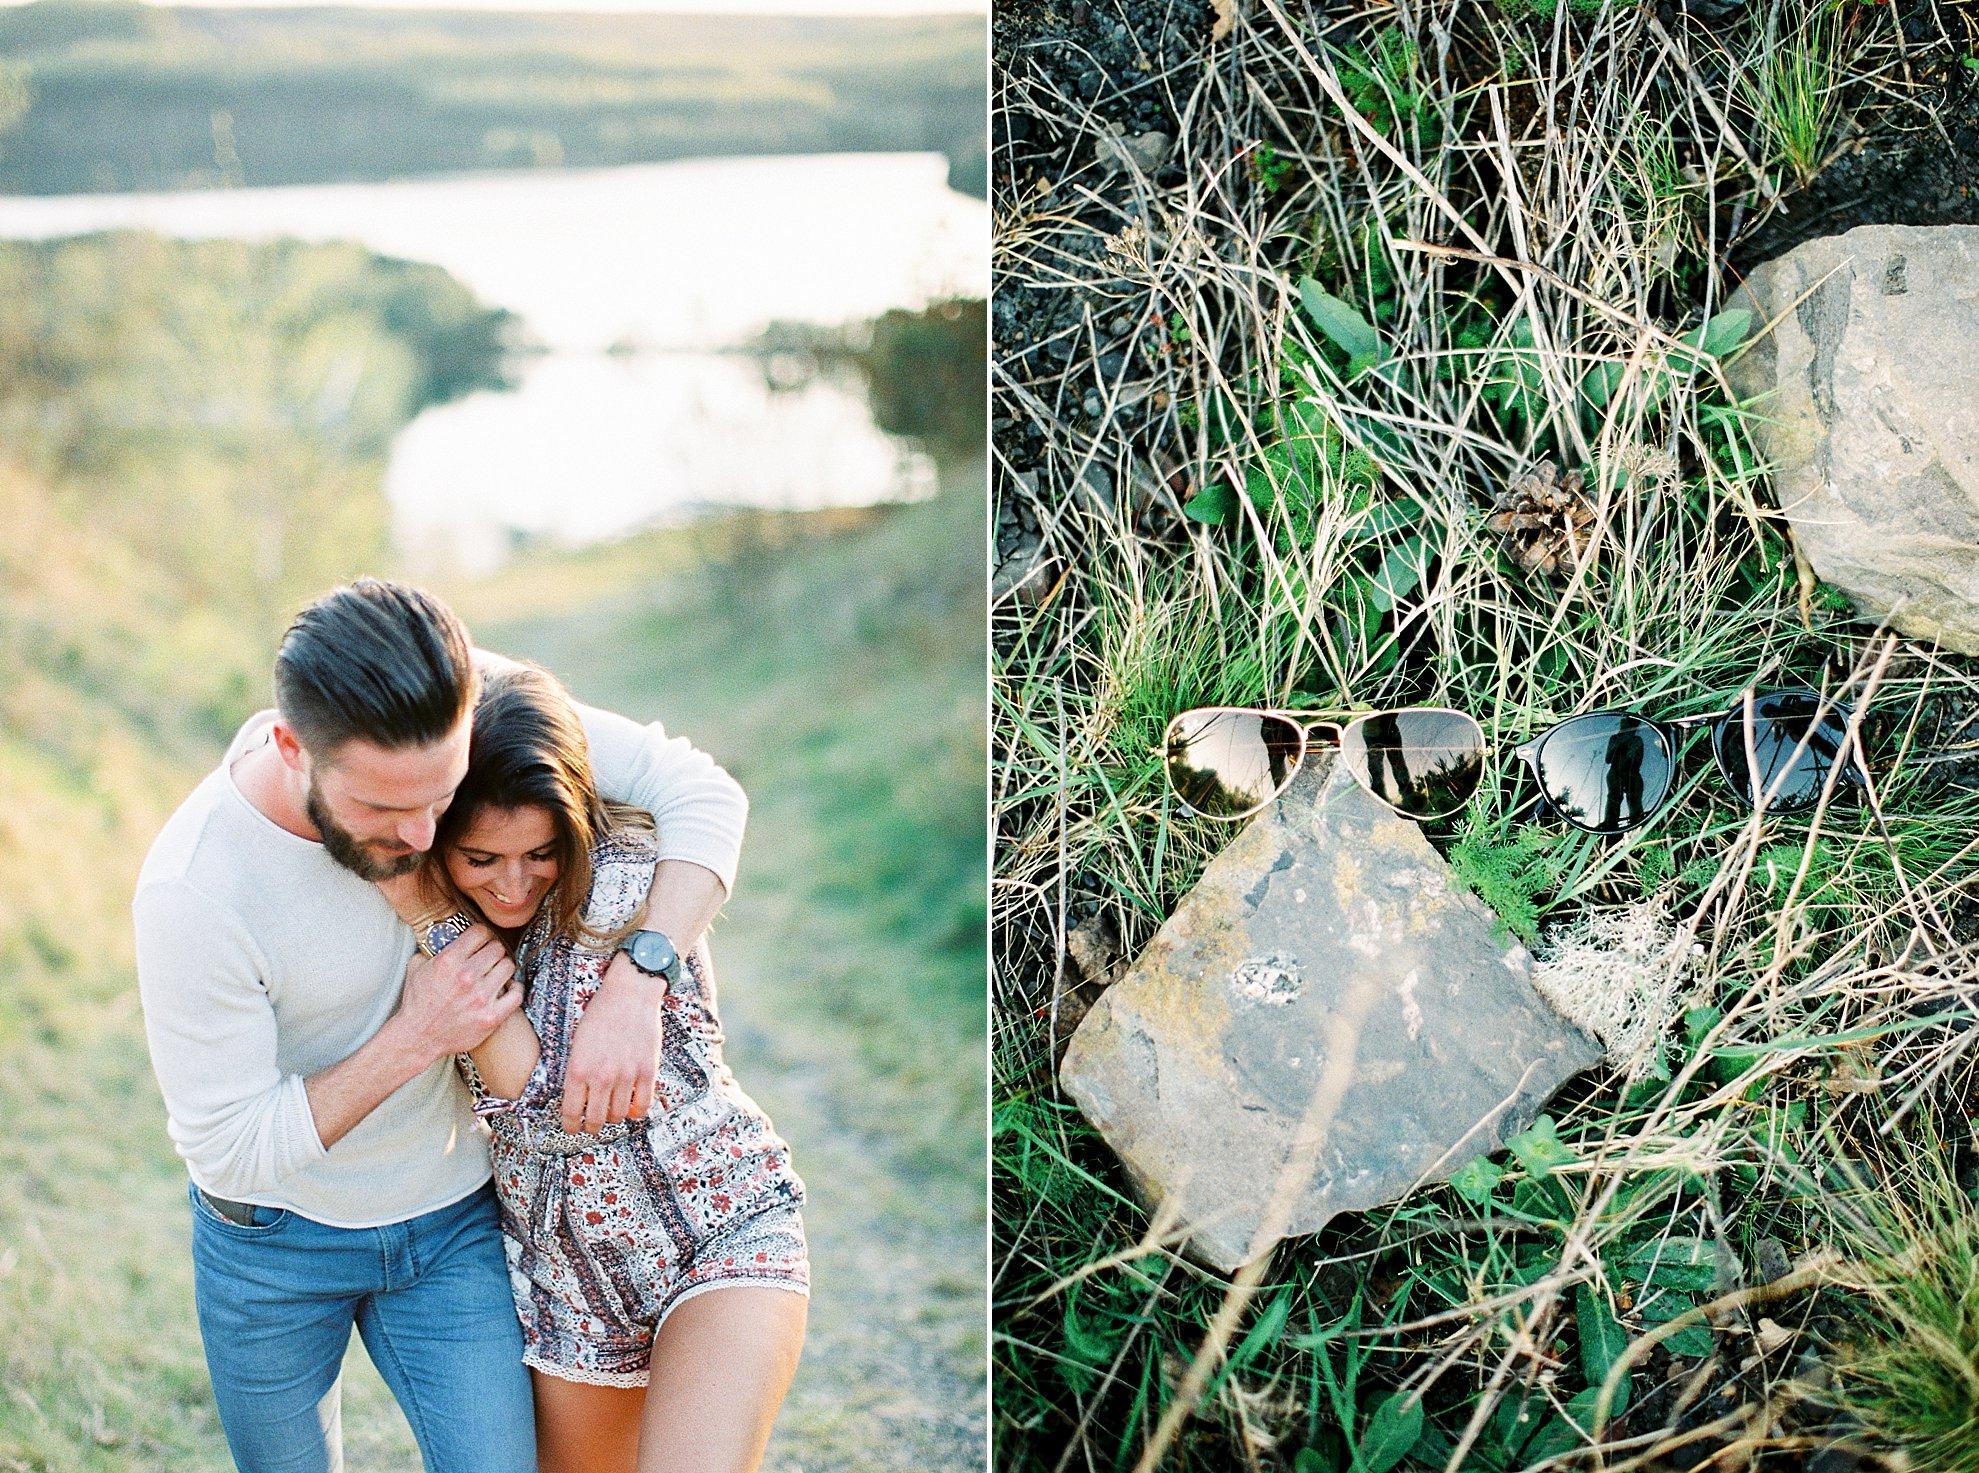 Amanda-Drost-Fine-art-photography-film-fotografie-analoog_0192.jpg